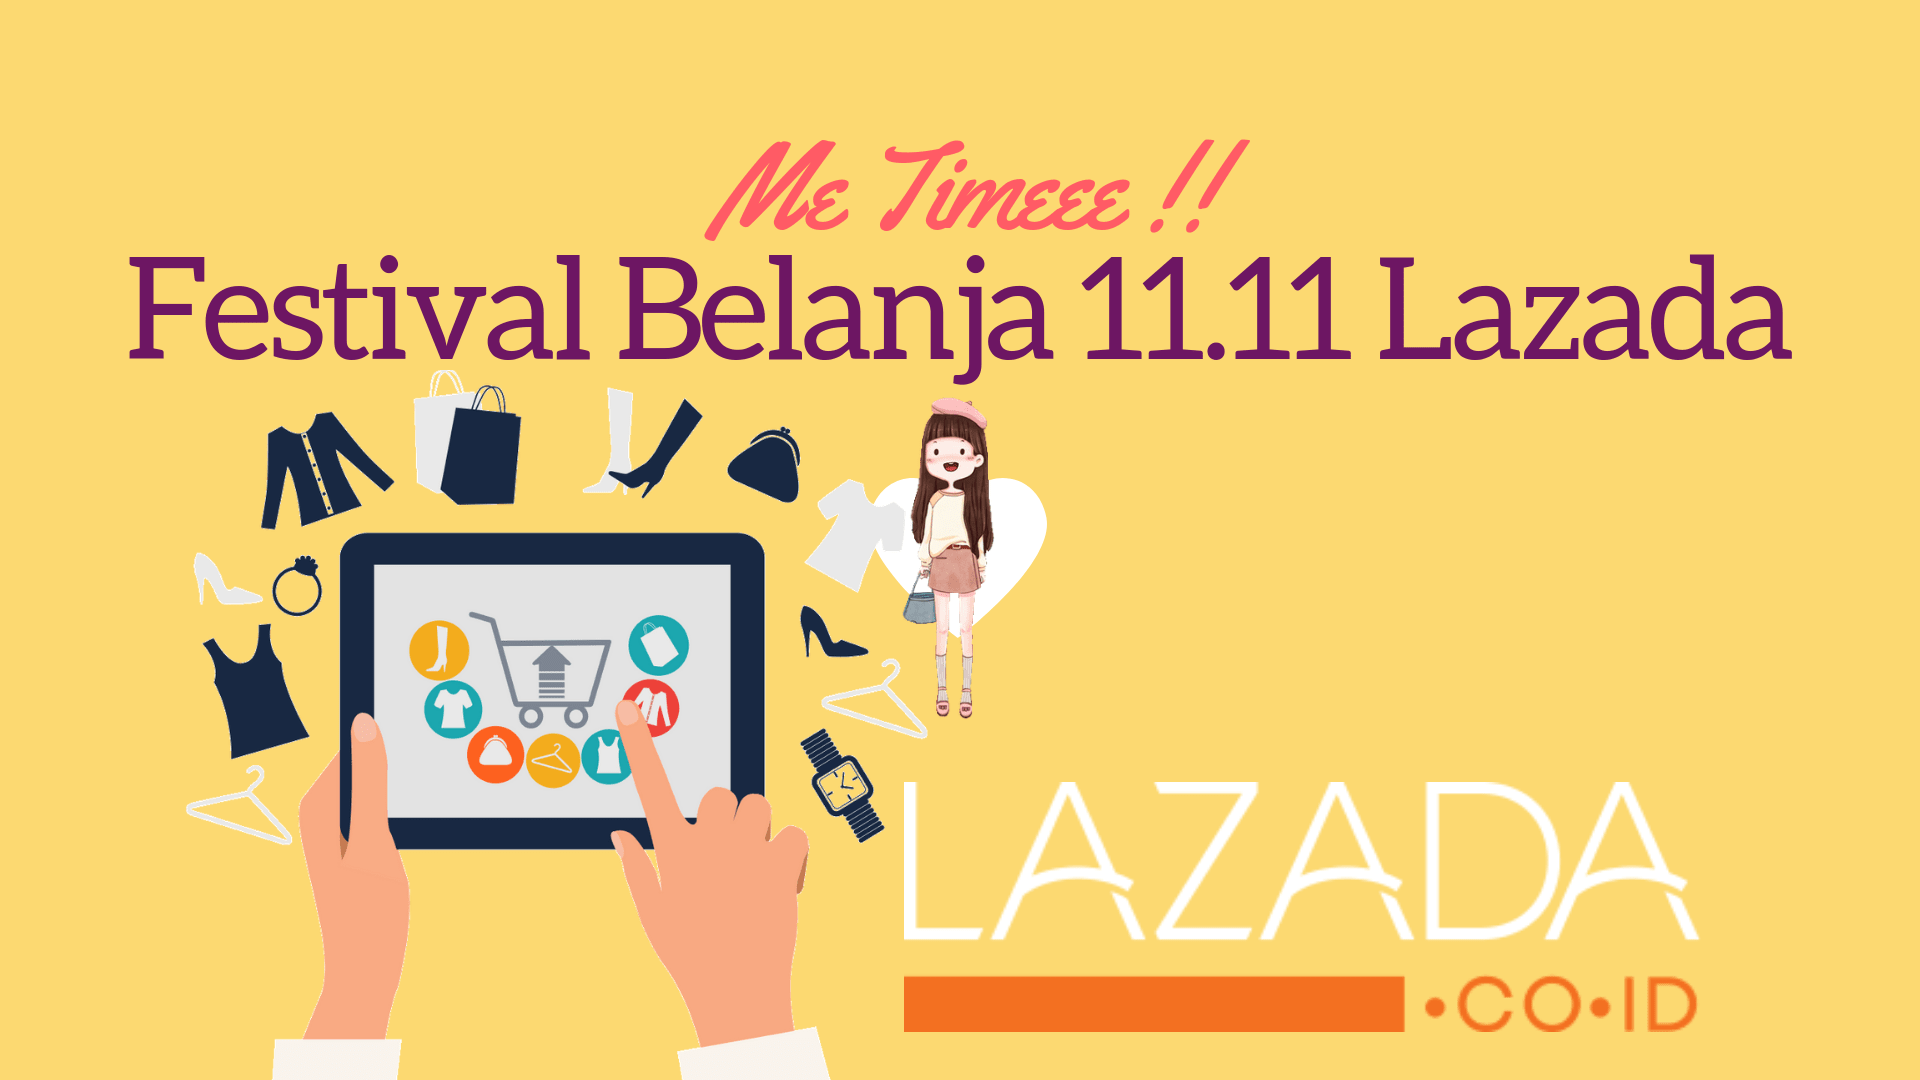 Festival Belanja 11.11, Me Time Ku Bersama Lazada